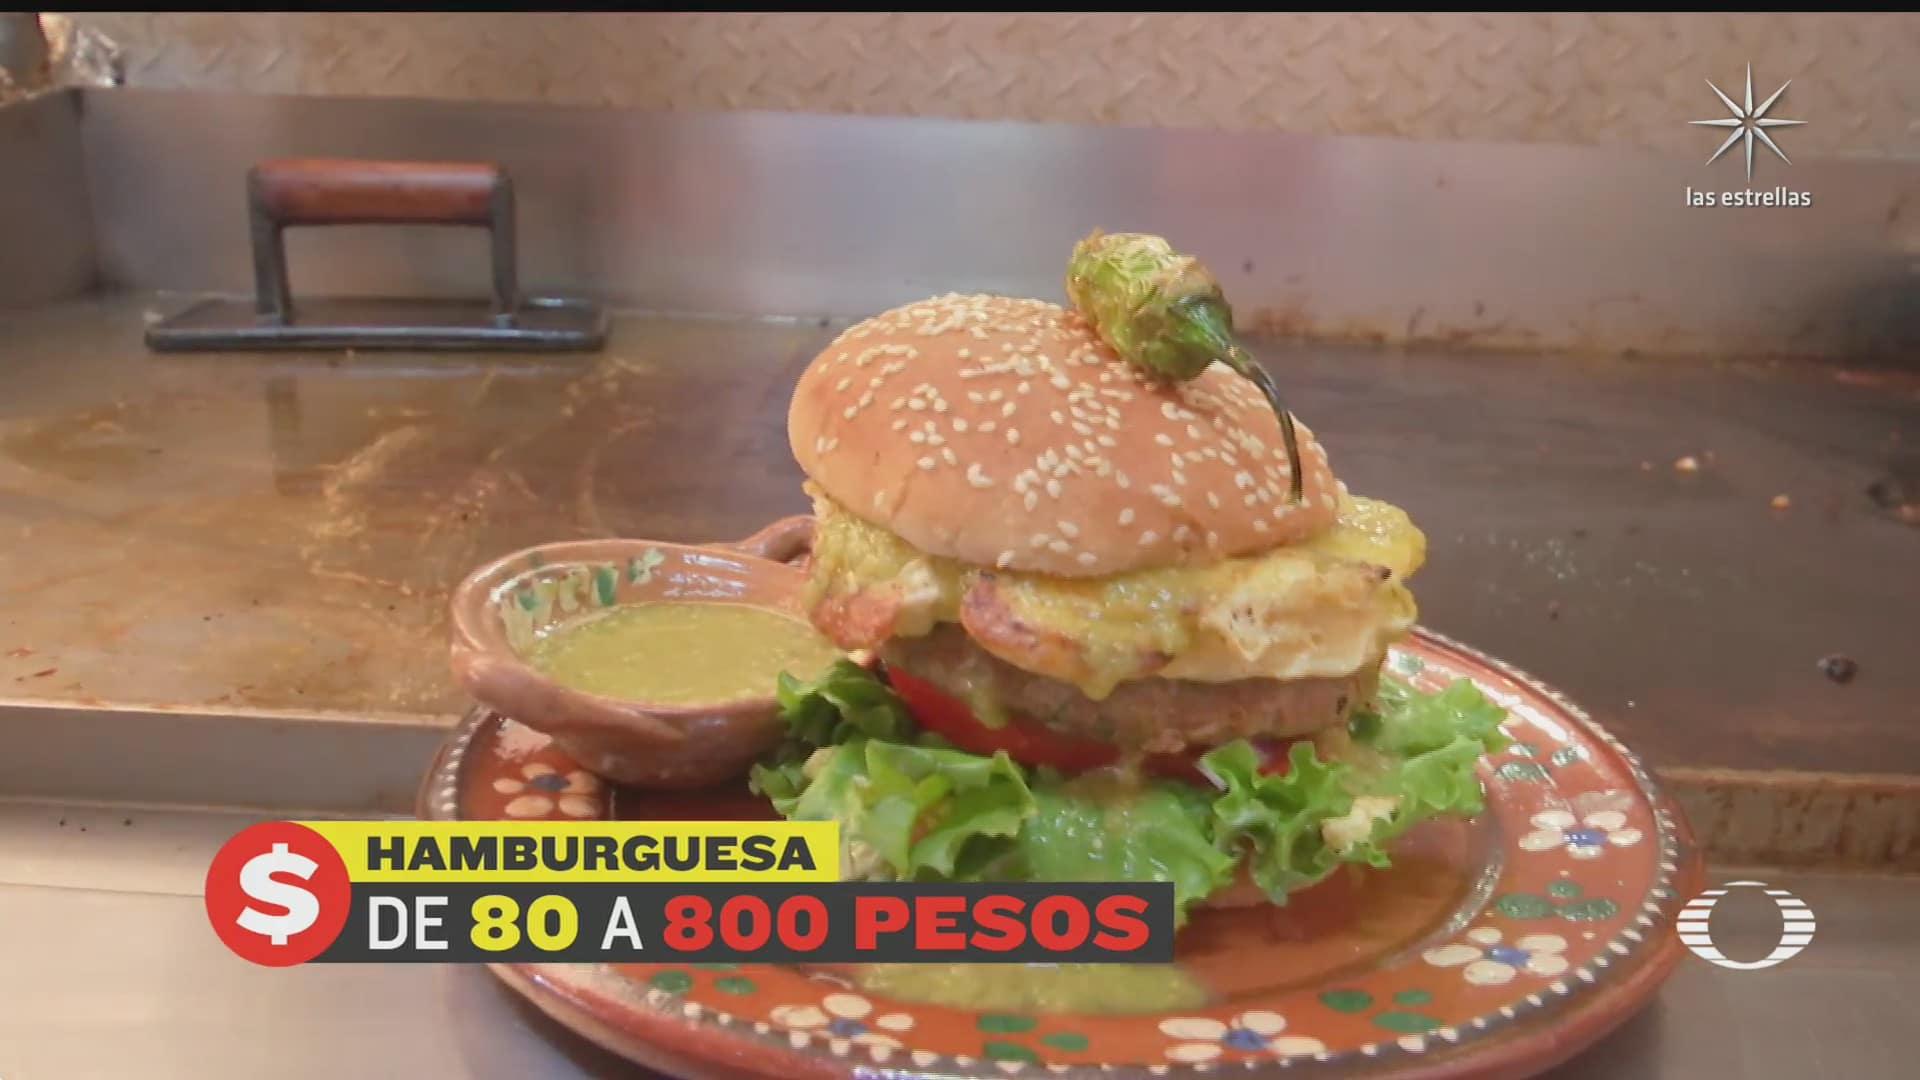 celebran el dia internacional de la hamburguesa en mexico